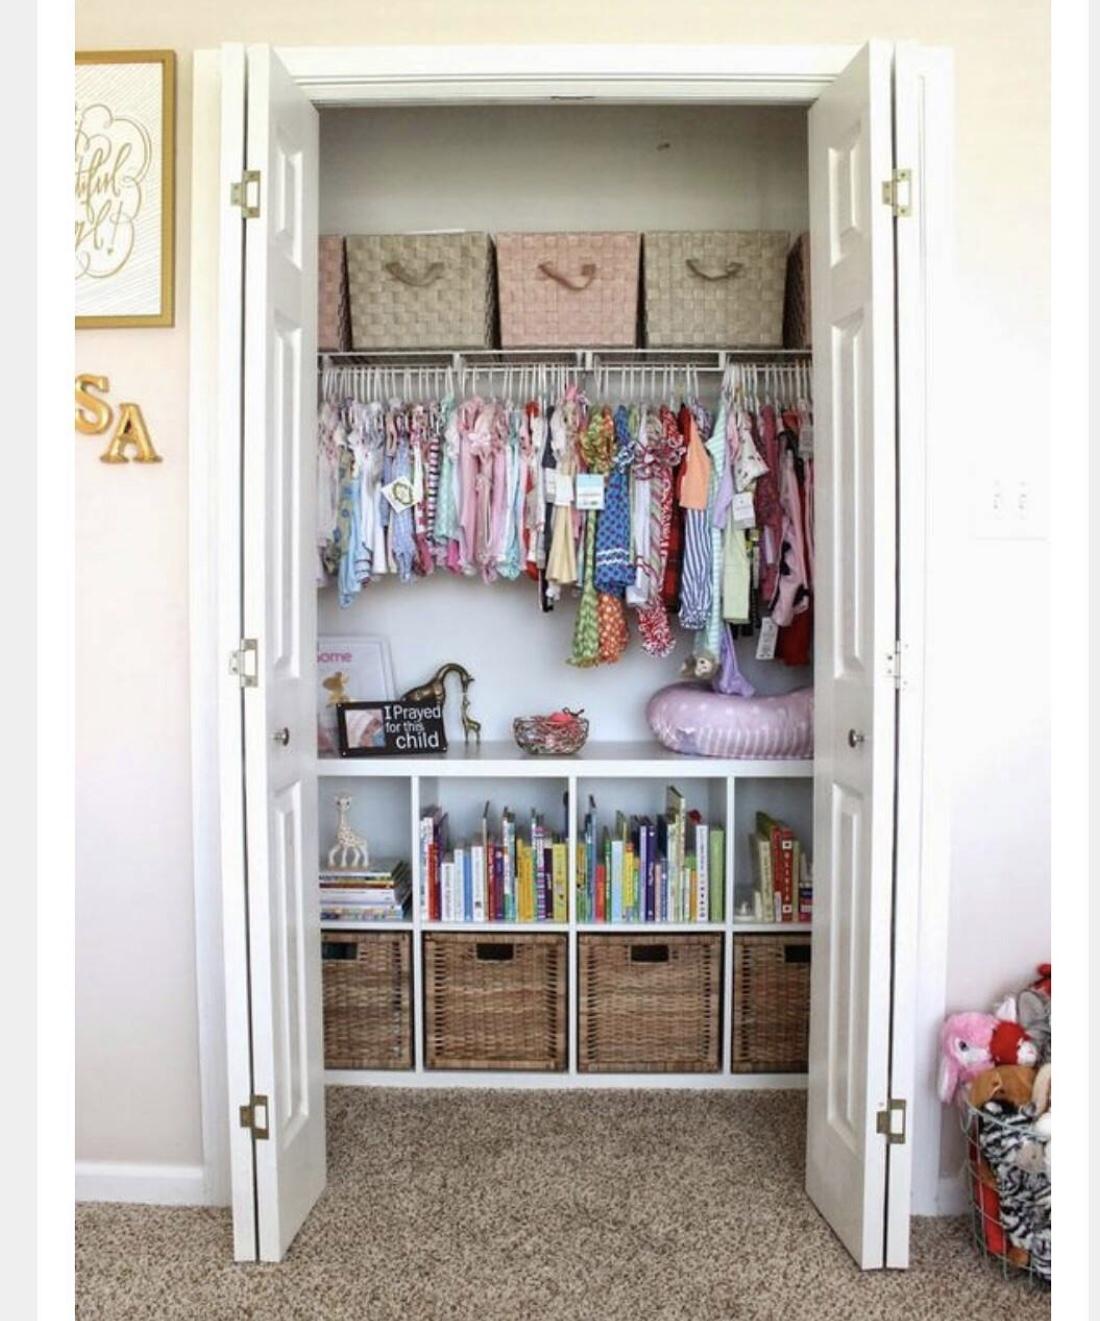 nursery wardrobe shelving-nursery organisation